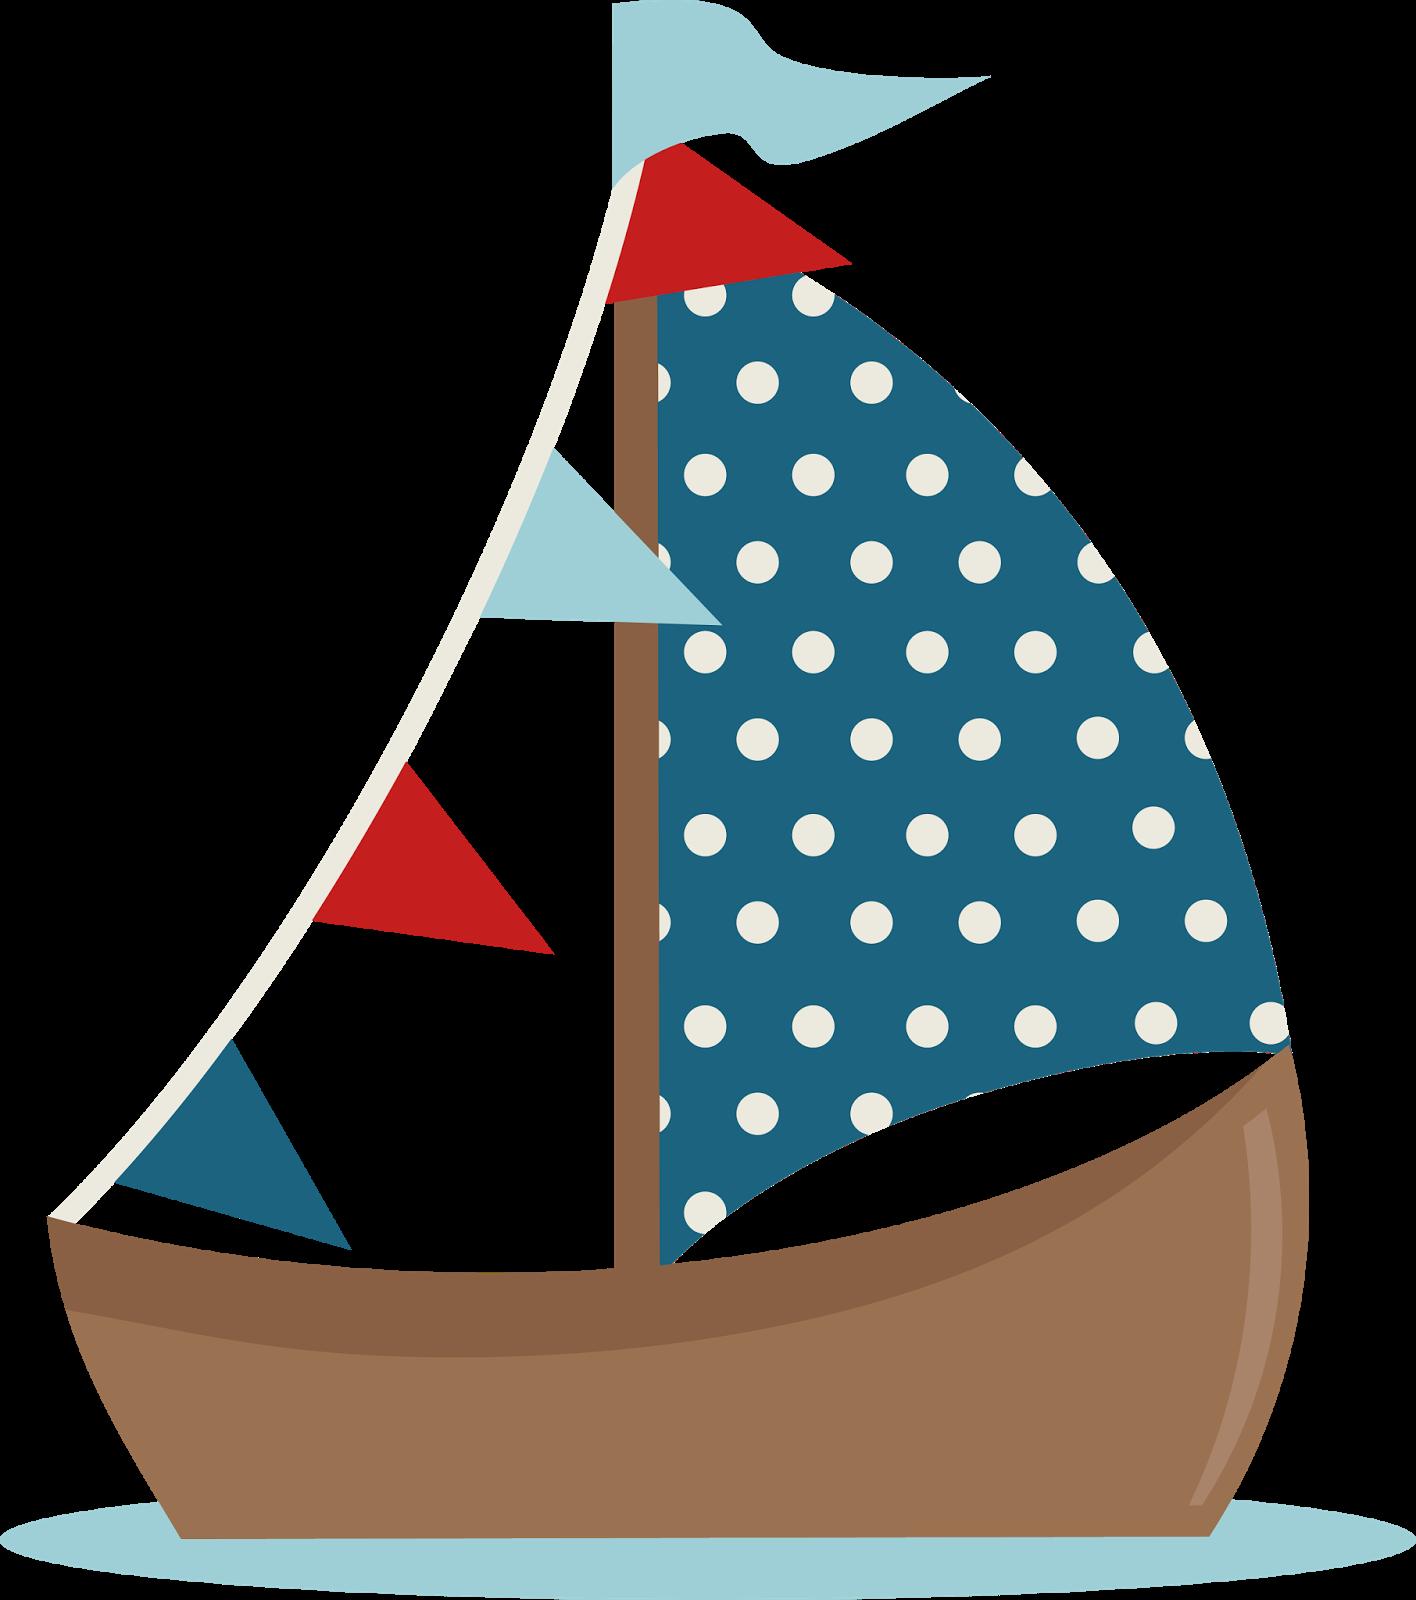 Ahoy pause dream enjoy. Waves clipart sailboat